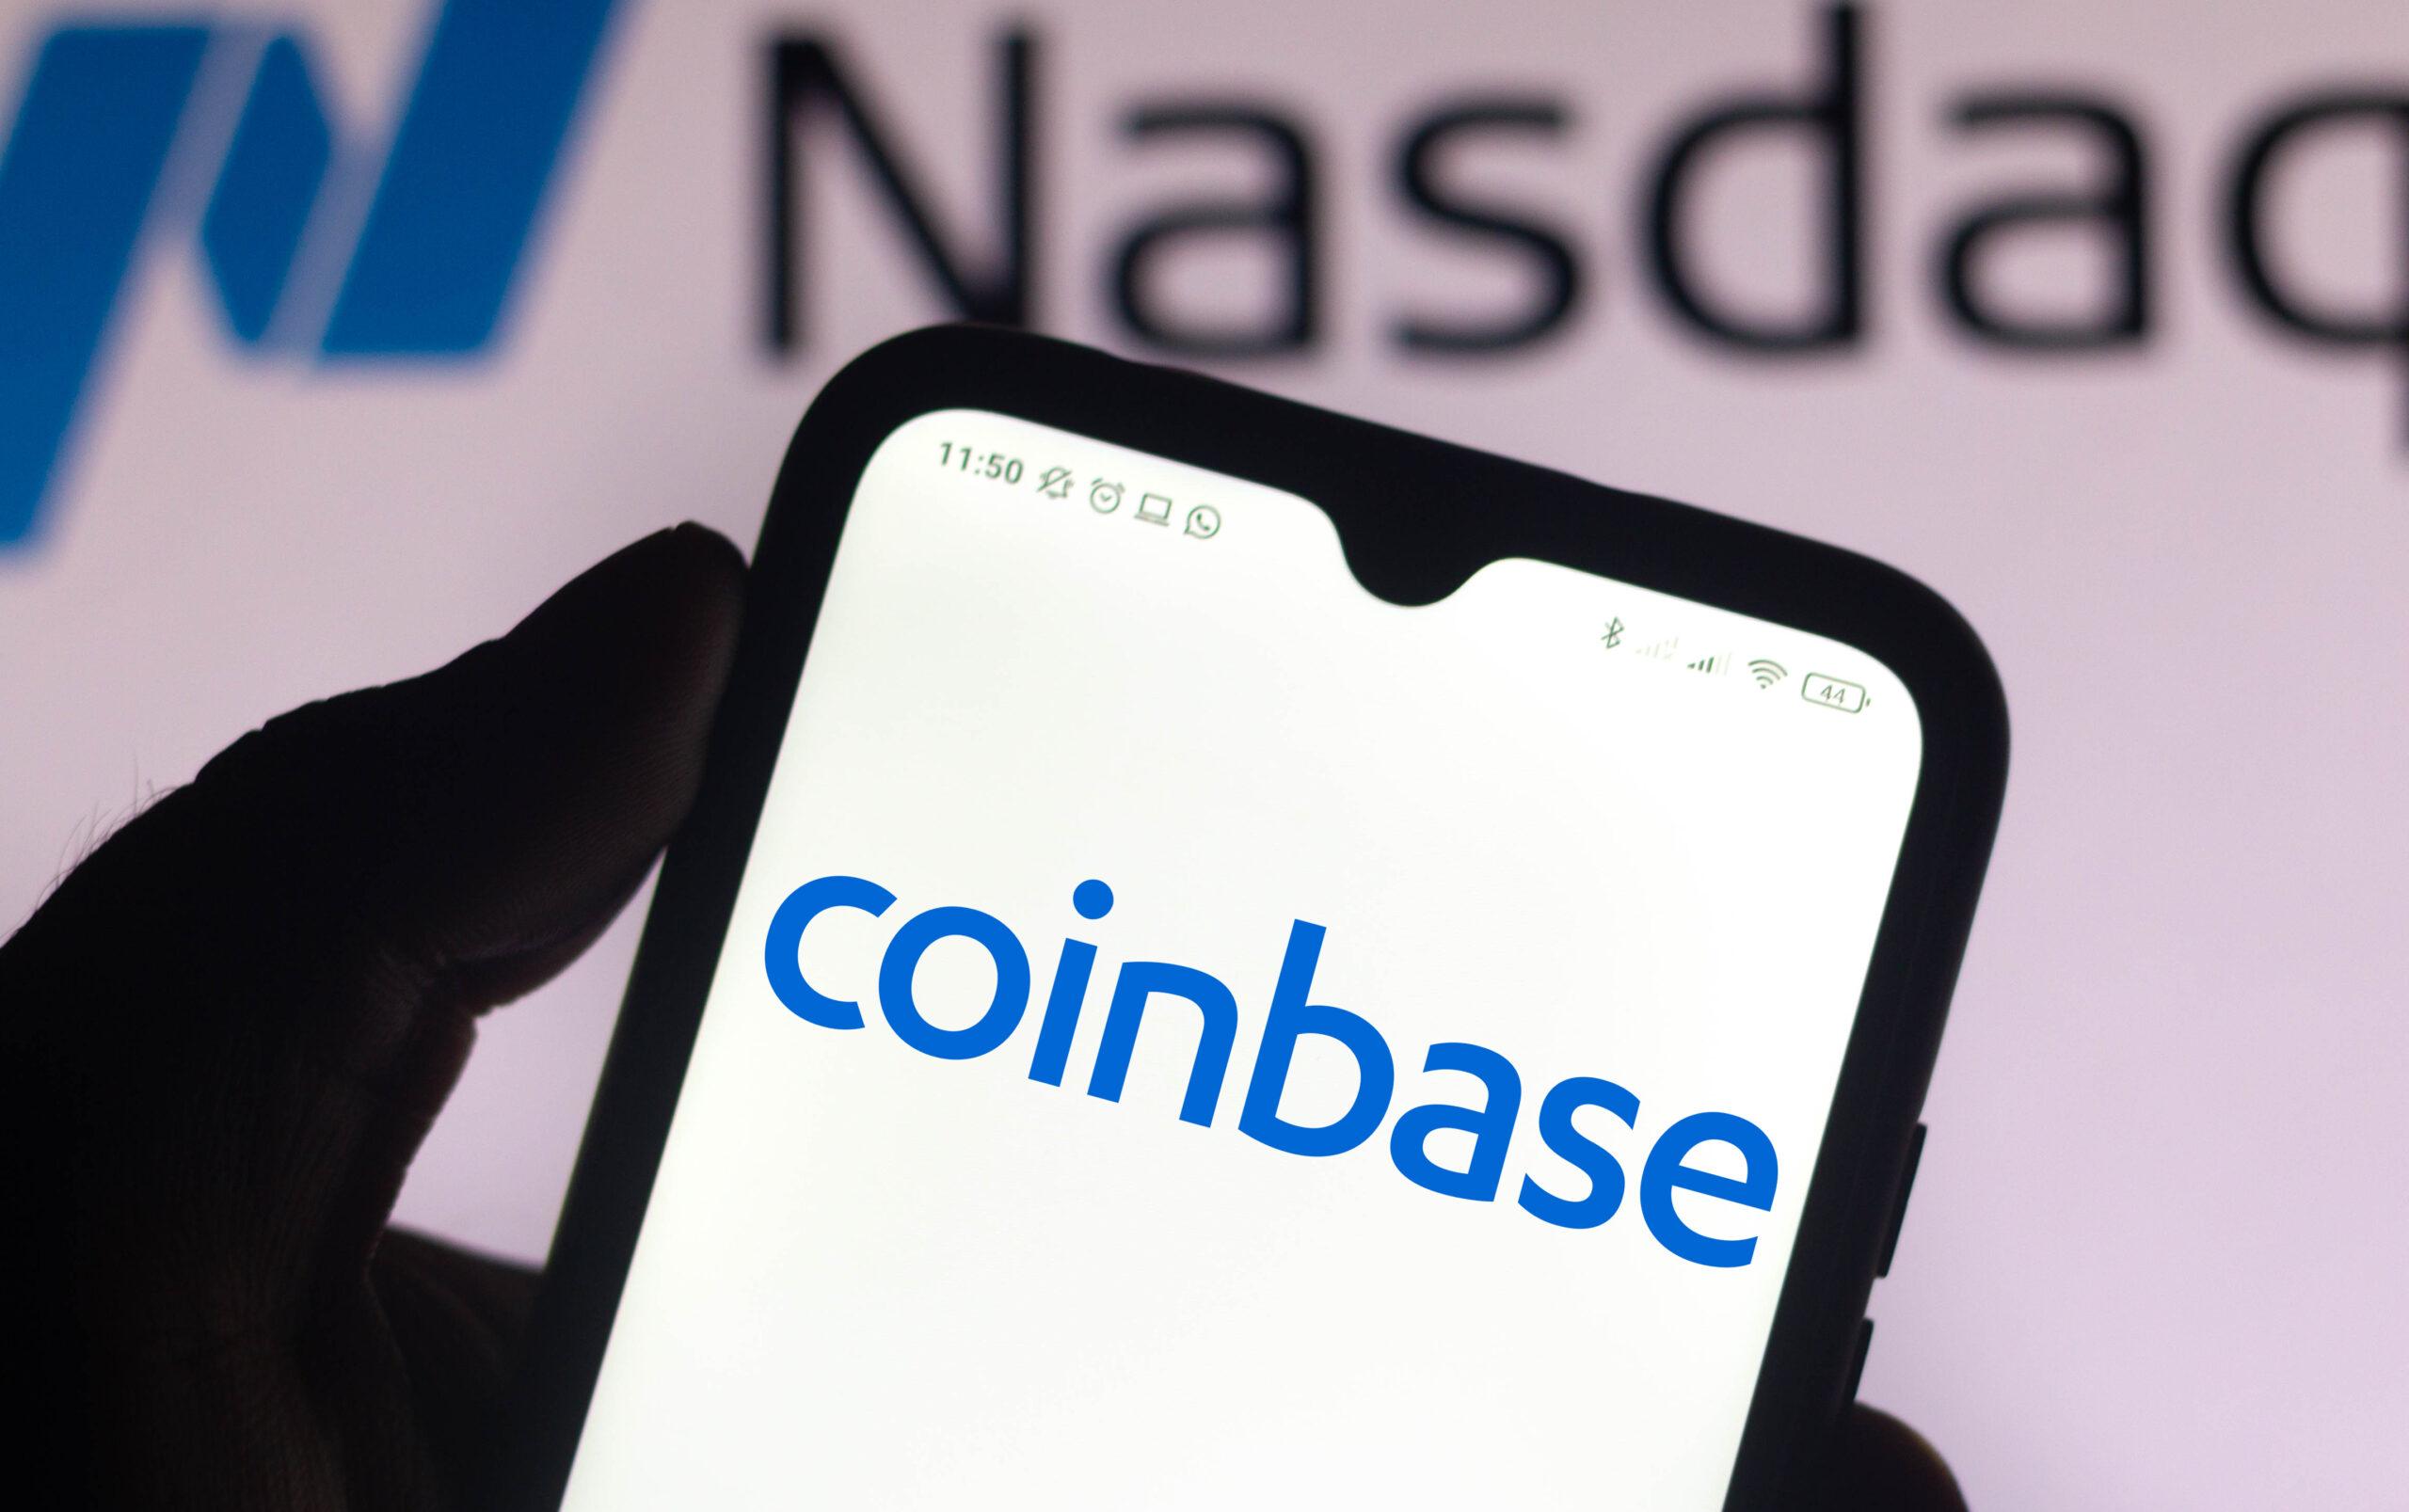 Coinbase puts $4B aside